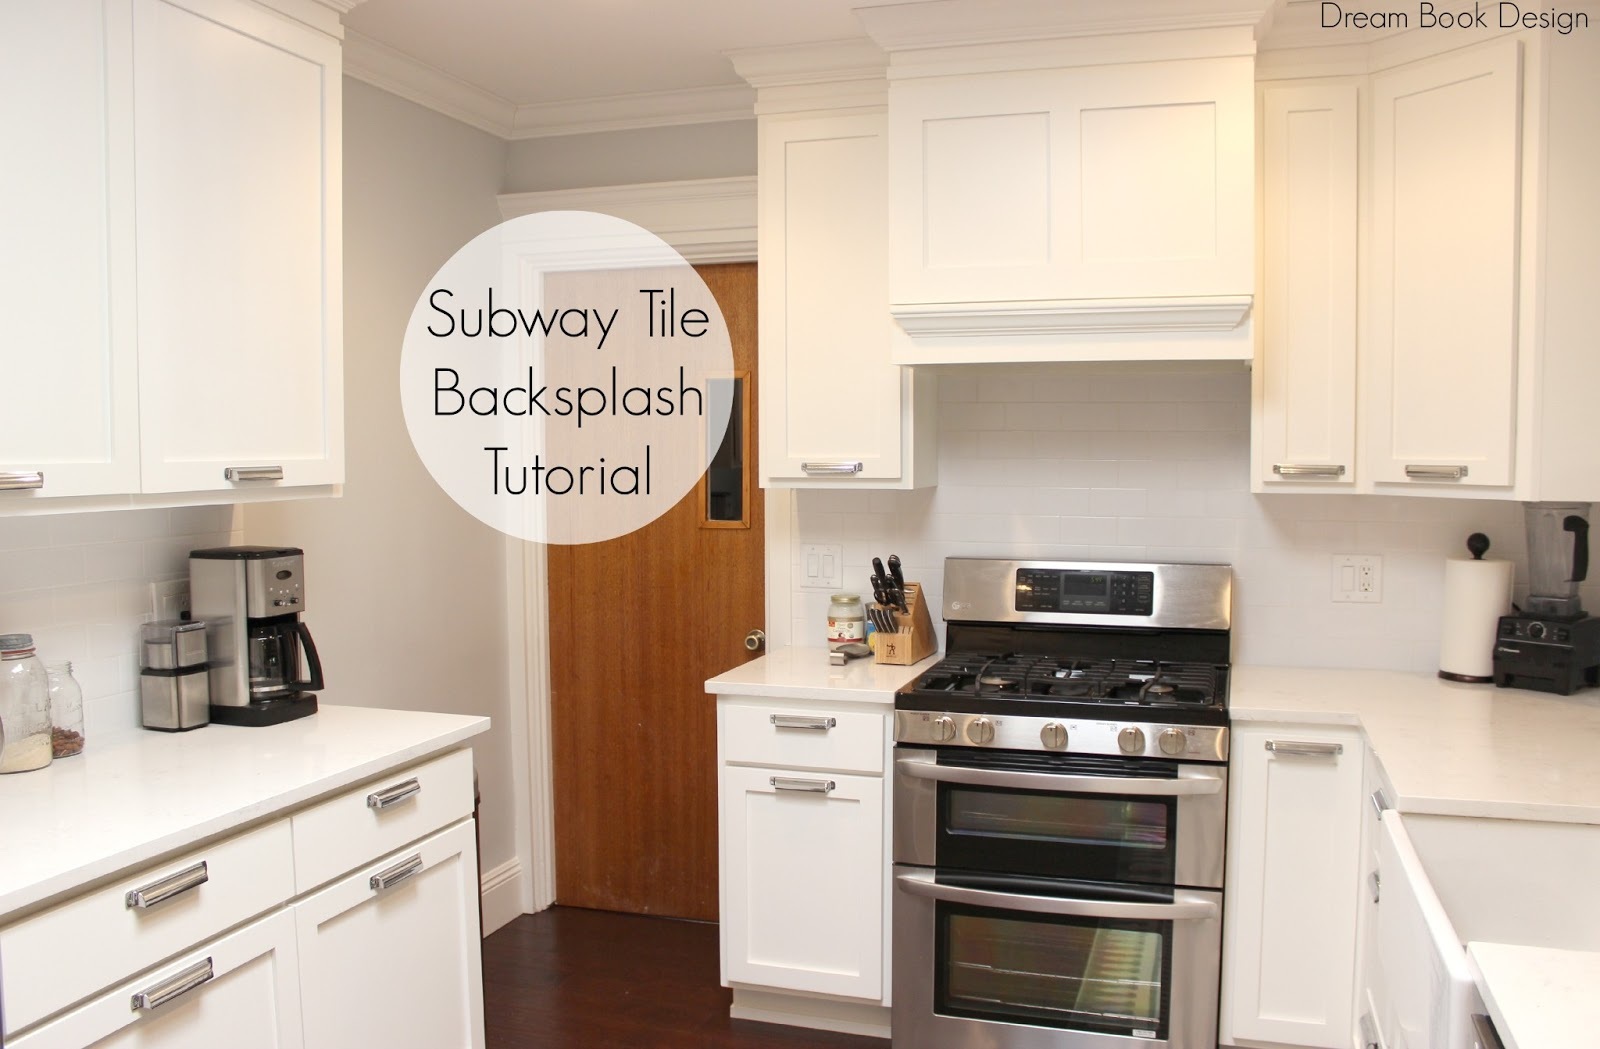 easy diy subway tile backsplash tutorial kitchen subway tile backsplash Easy DIY Subway Tile Backsplash Tutorial